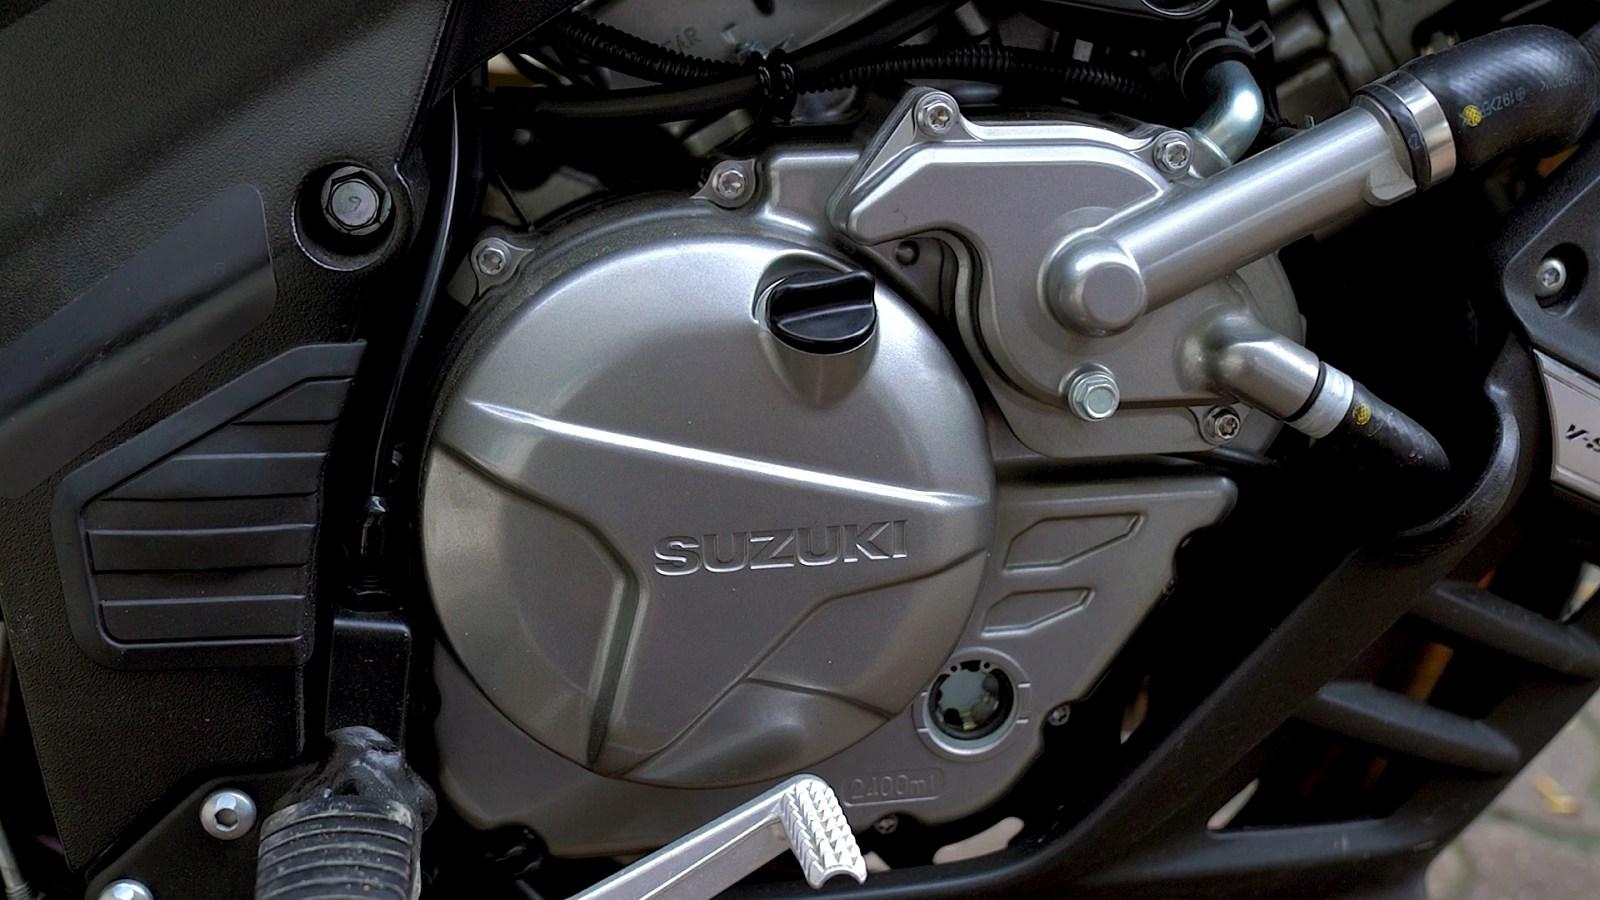 23 Suzuki DL 650 XT silnik